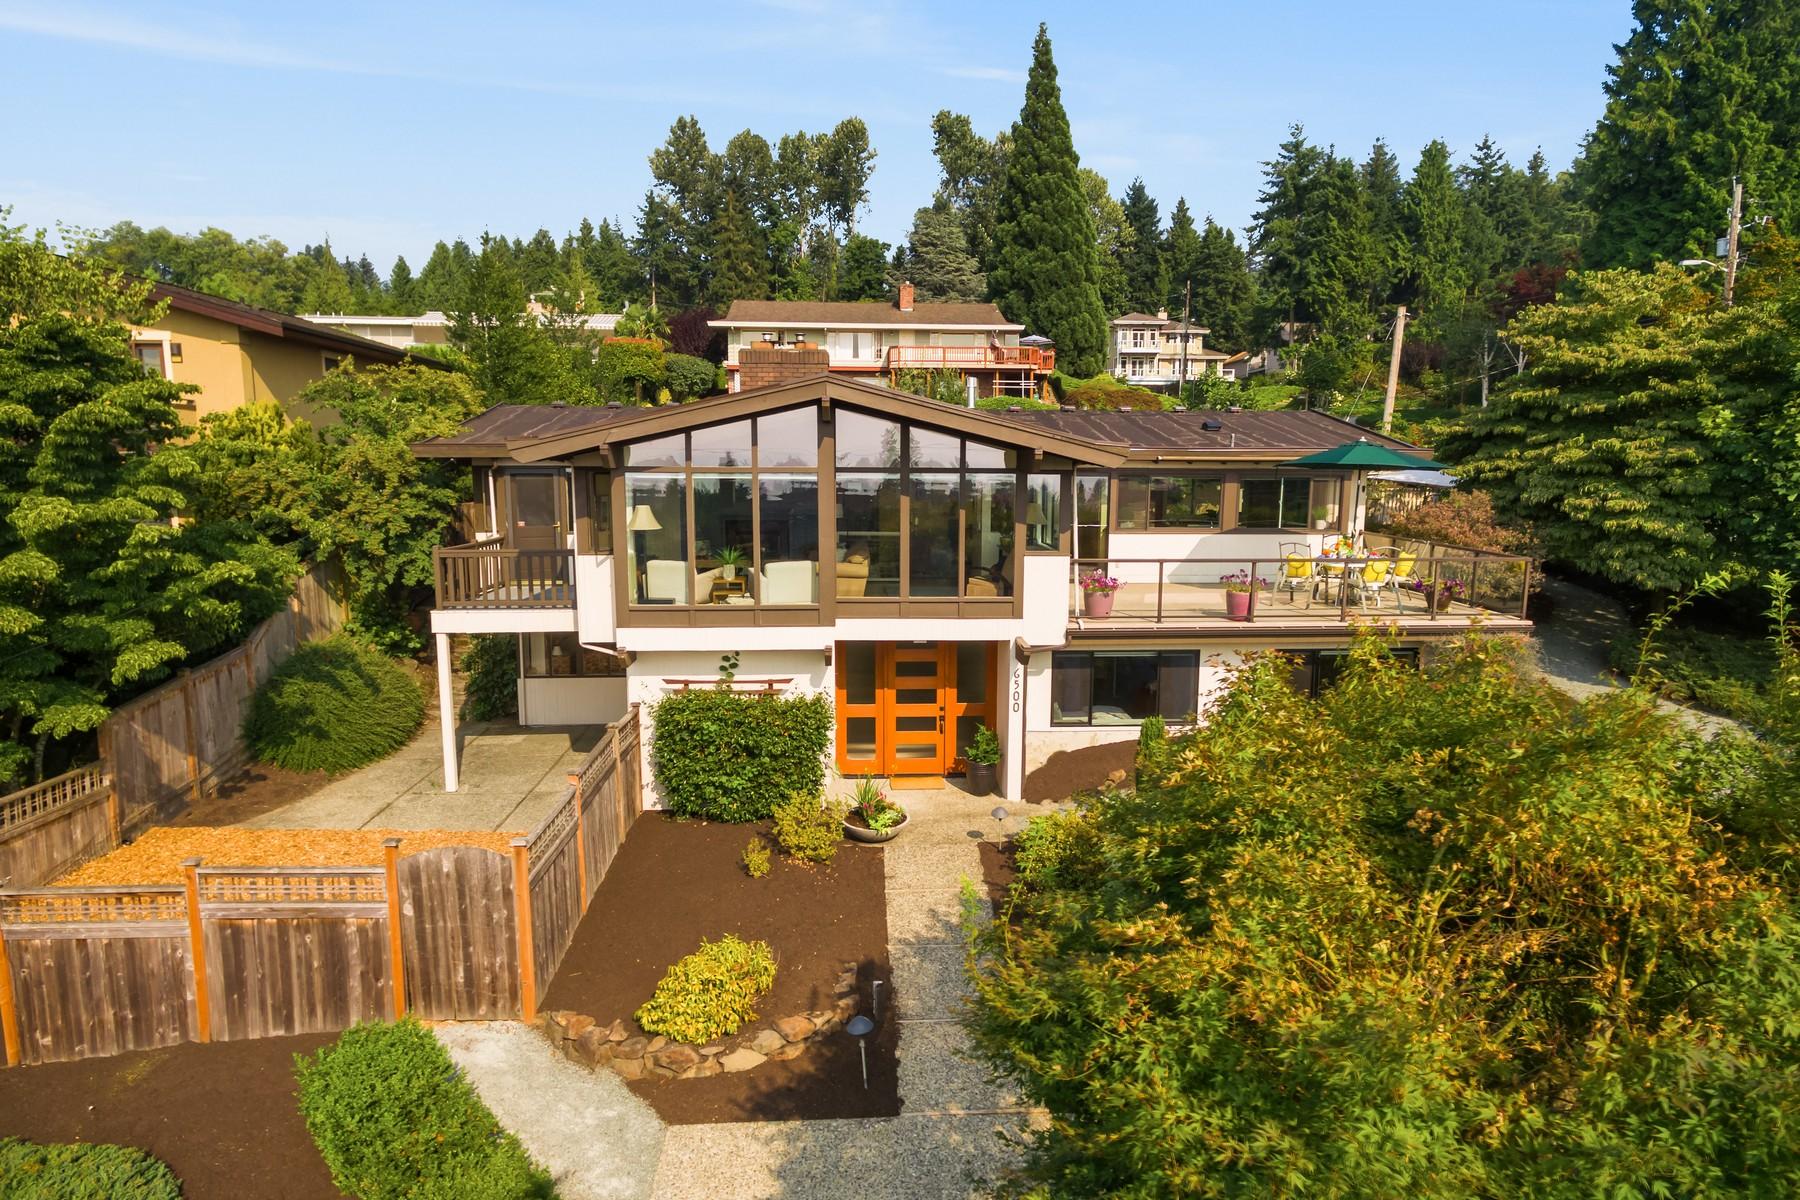 Single Family Home for Sale at Kirkland Mid-Century Rambler 6500 113th Ave NE Kirkland, Washington 98033 United States